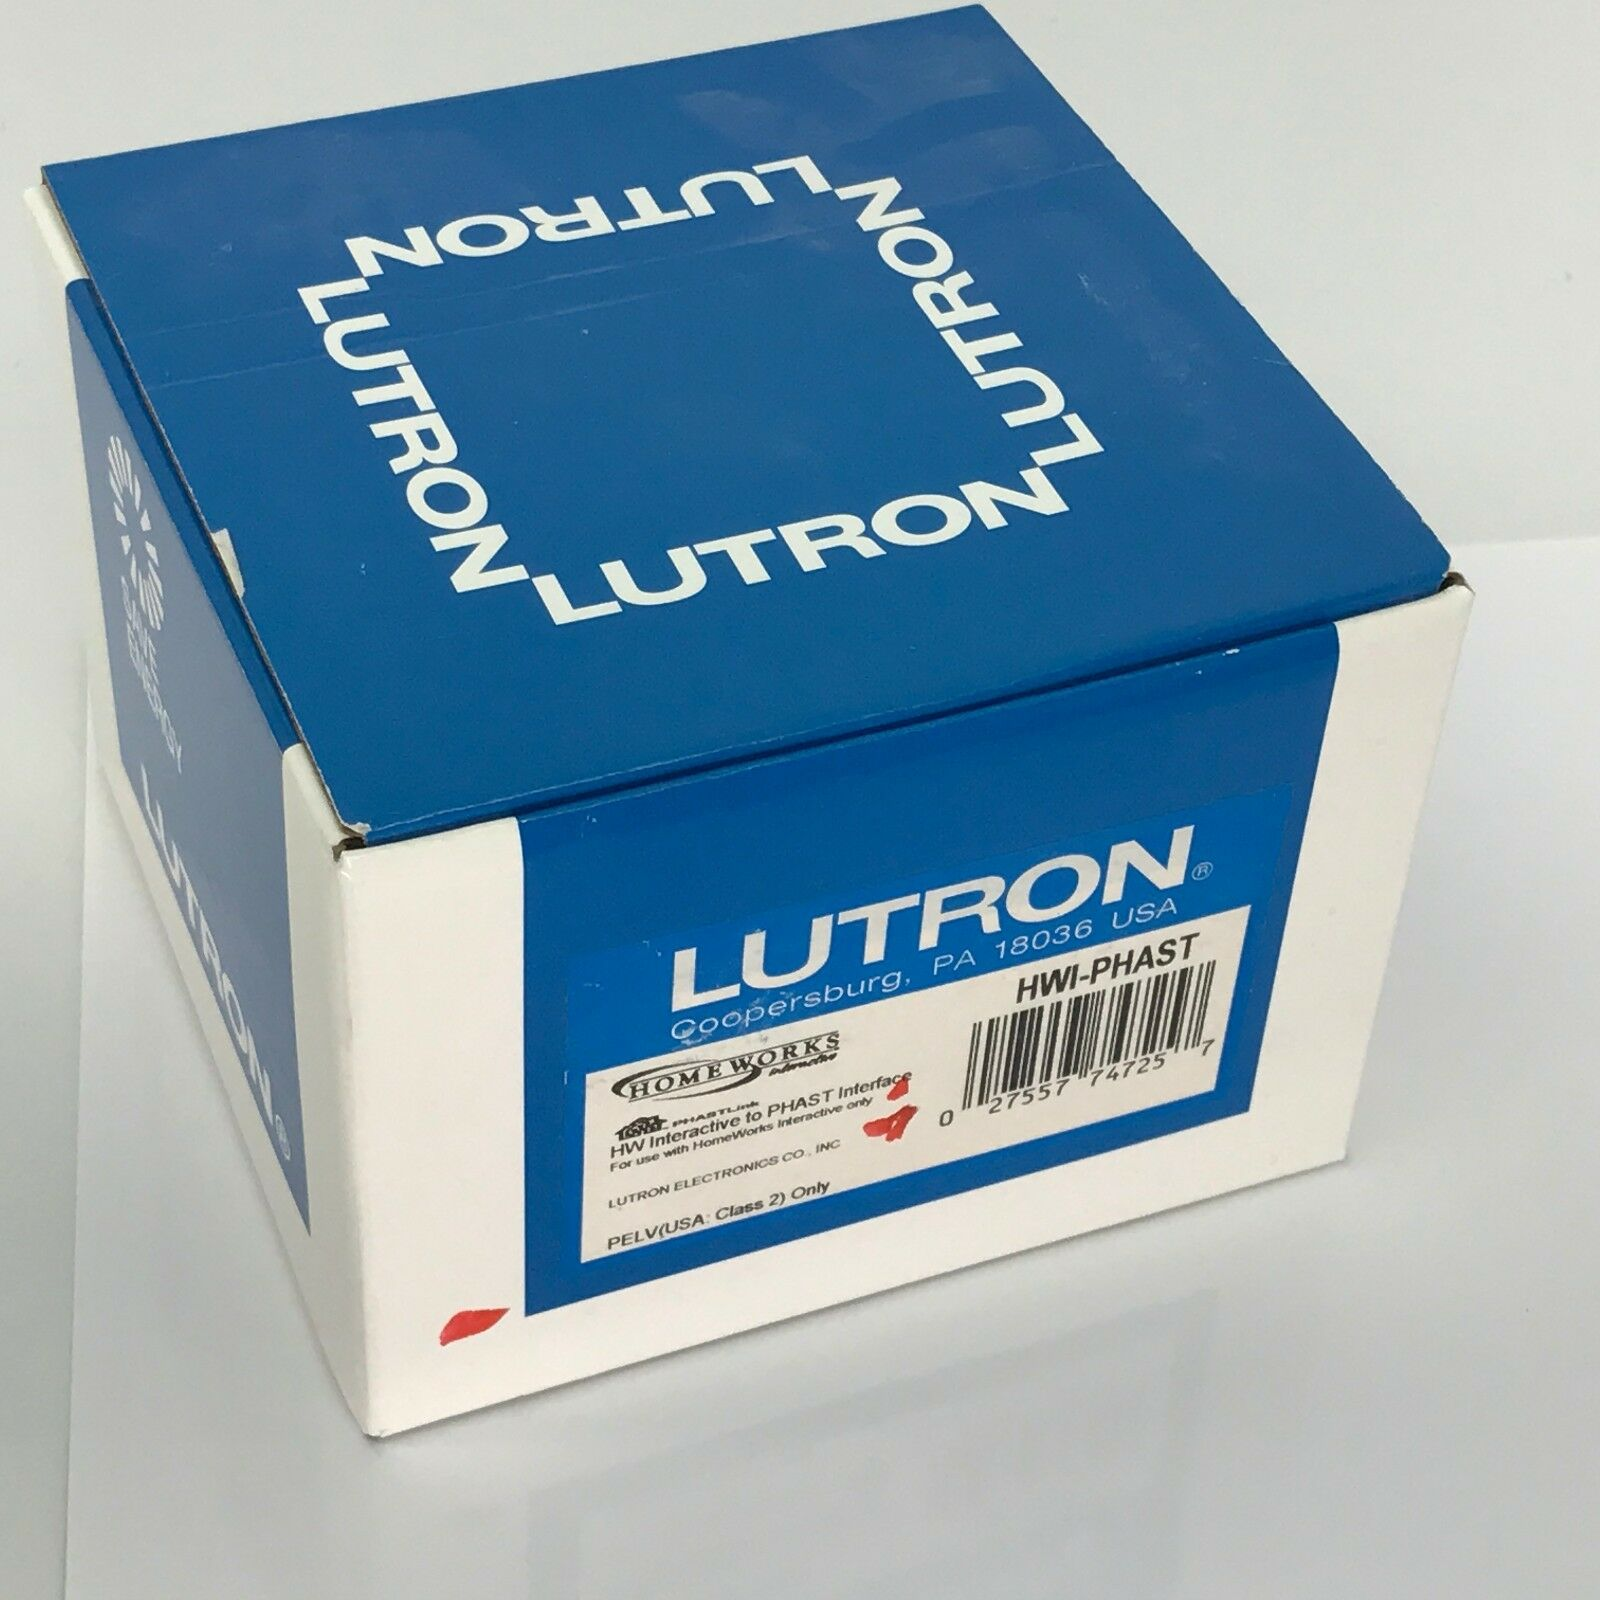 Lutron Homeworks to Phast Interface Hwi-phast - | eBay